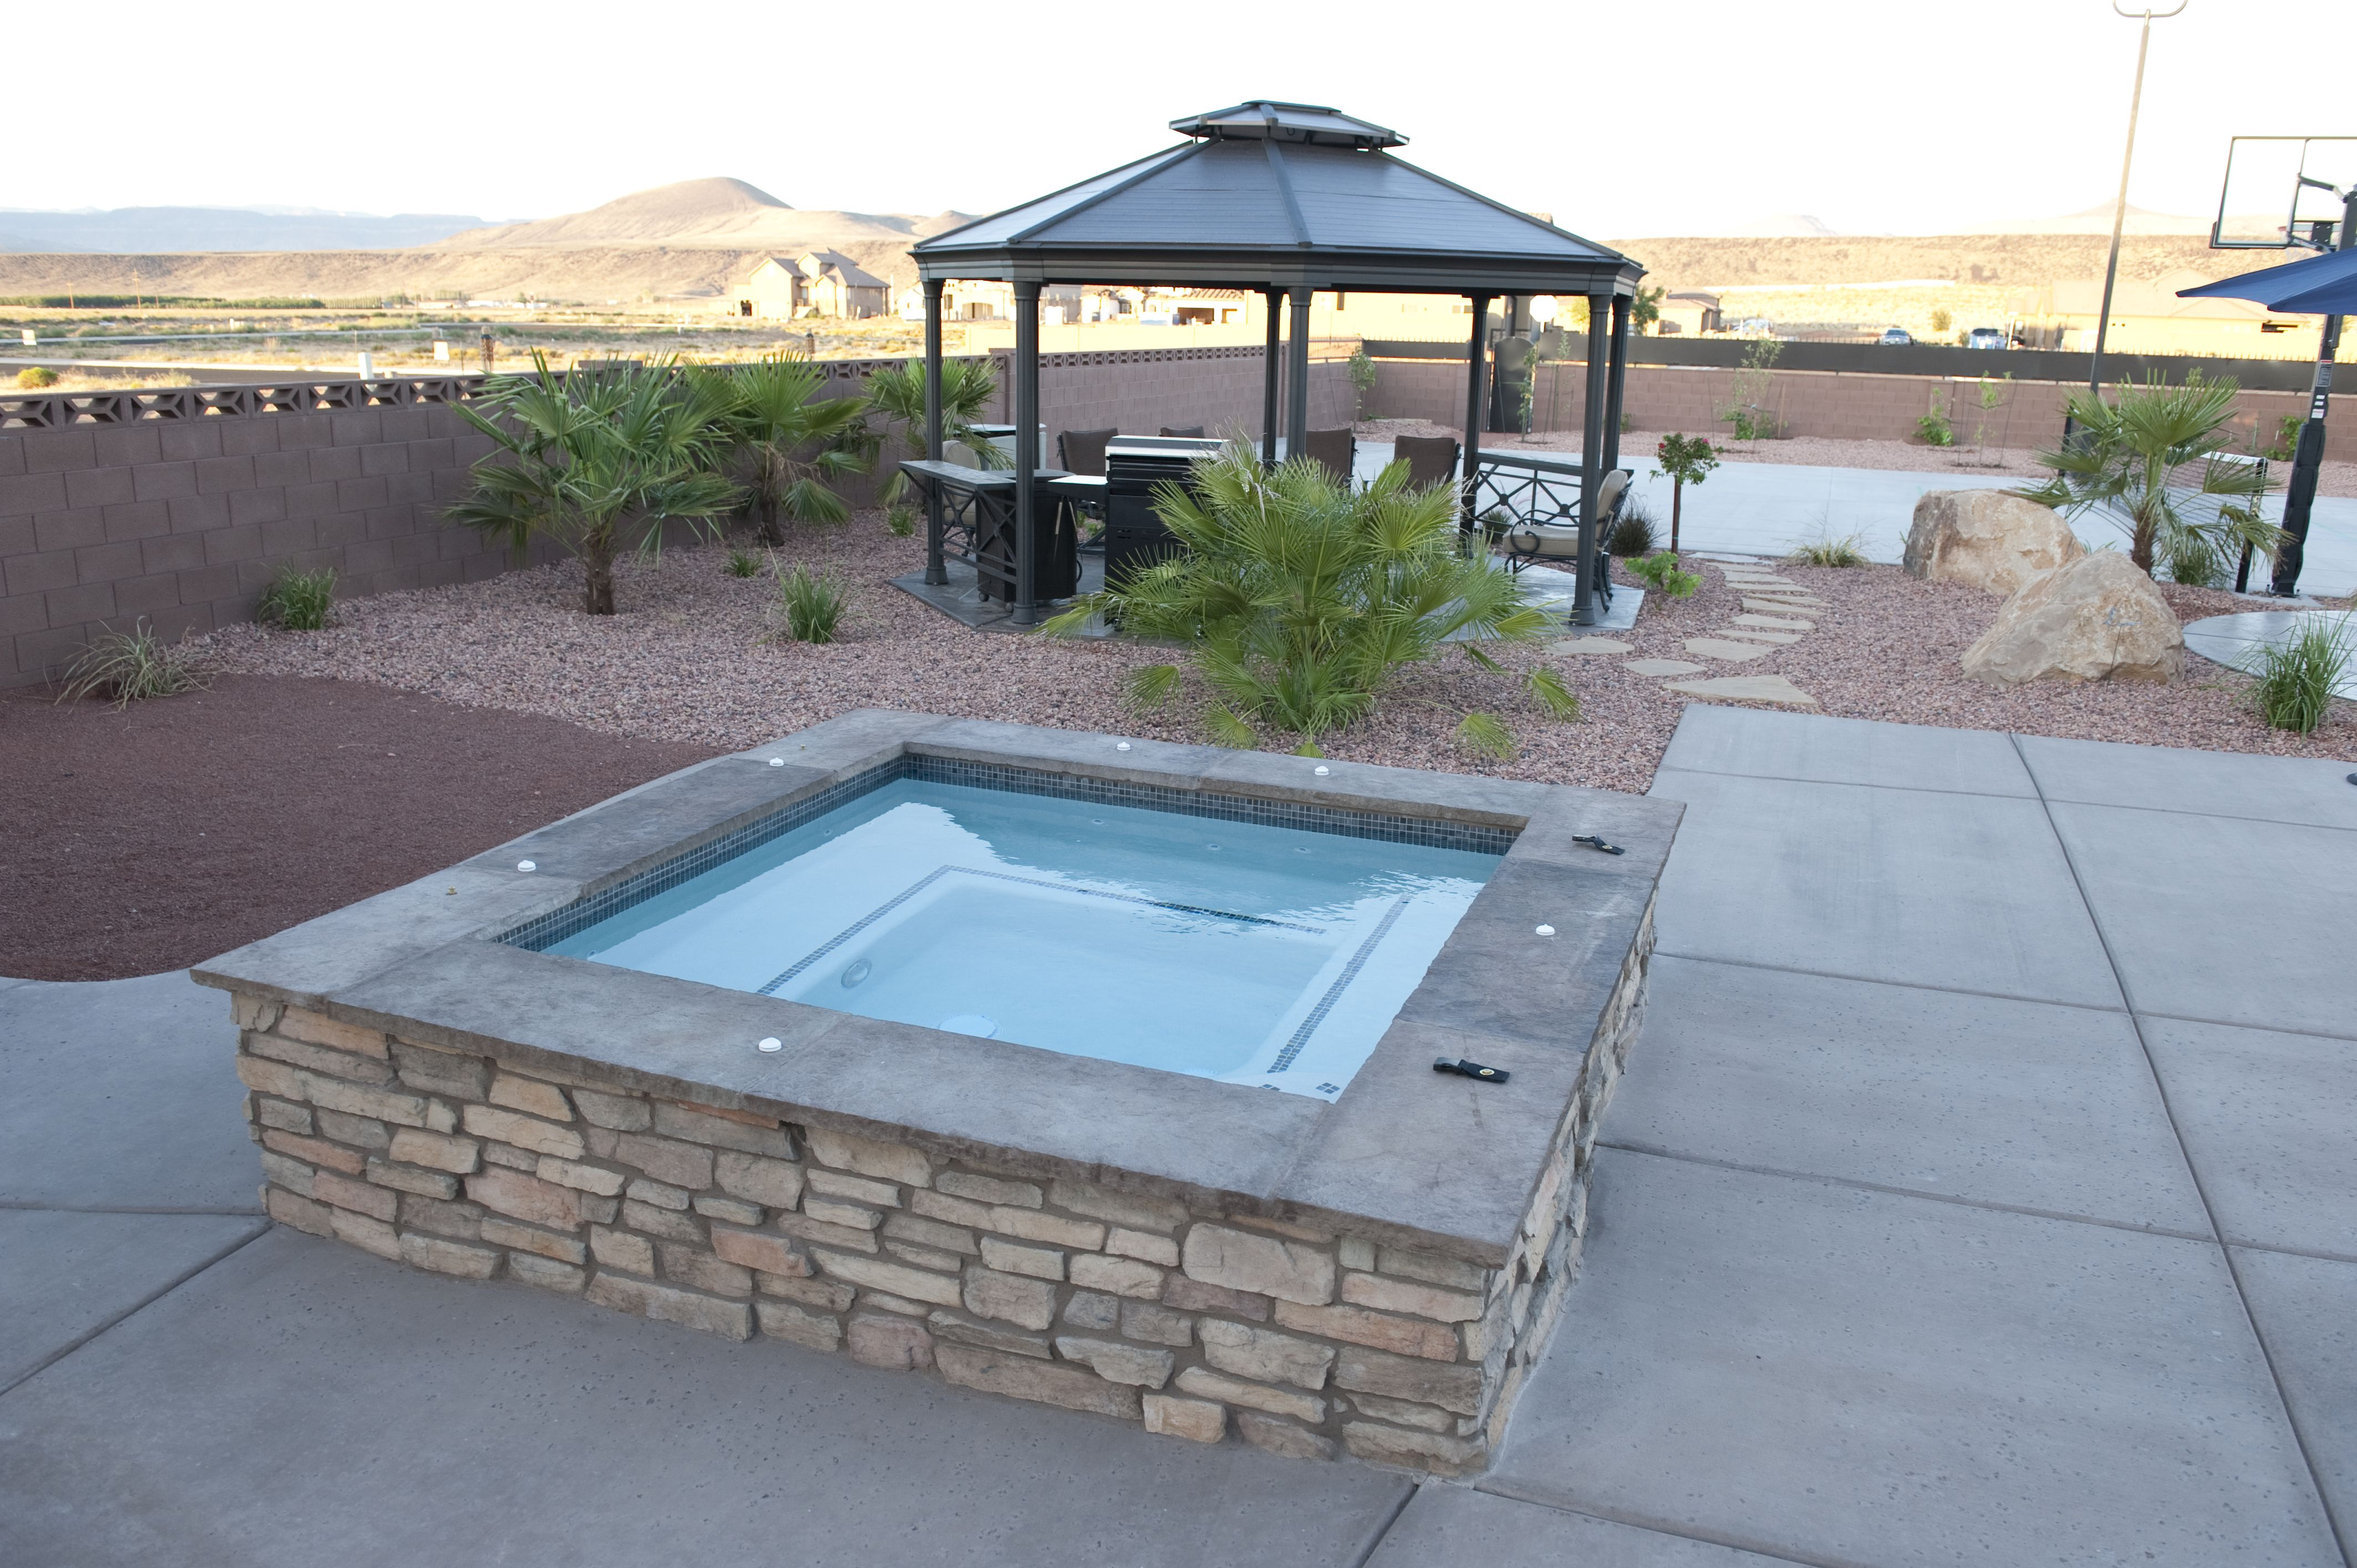 custom spa by American heritage homes http://ahhomes.com/pools-spas/